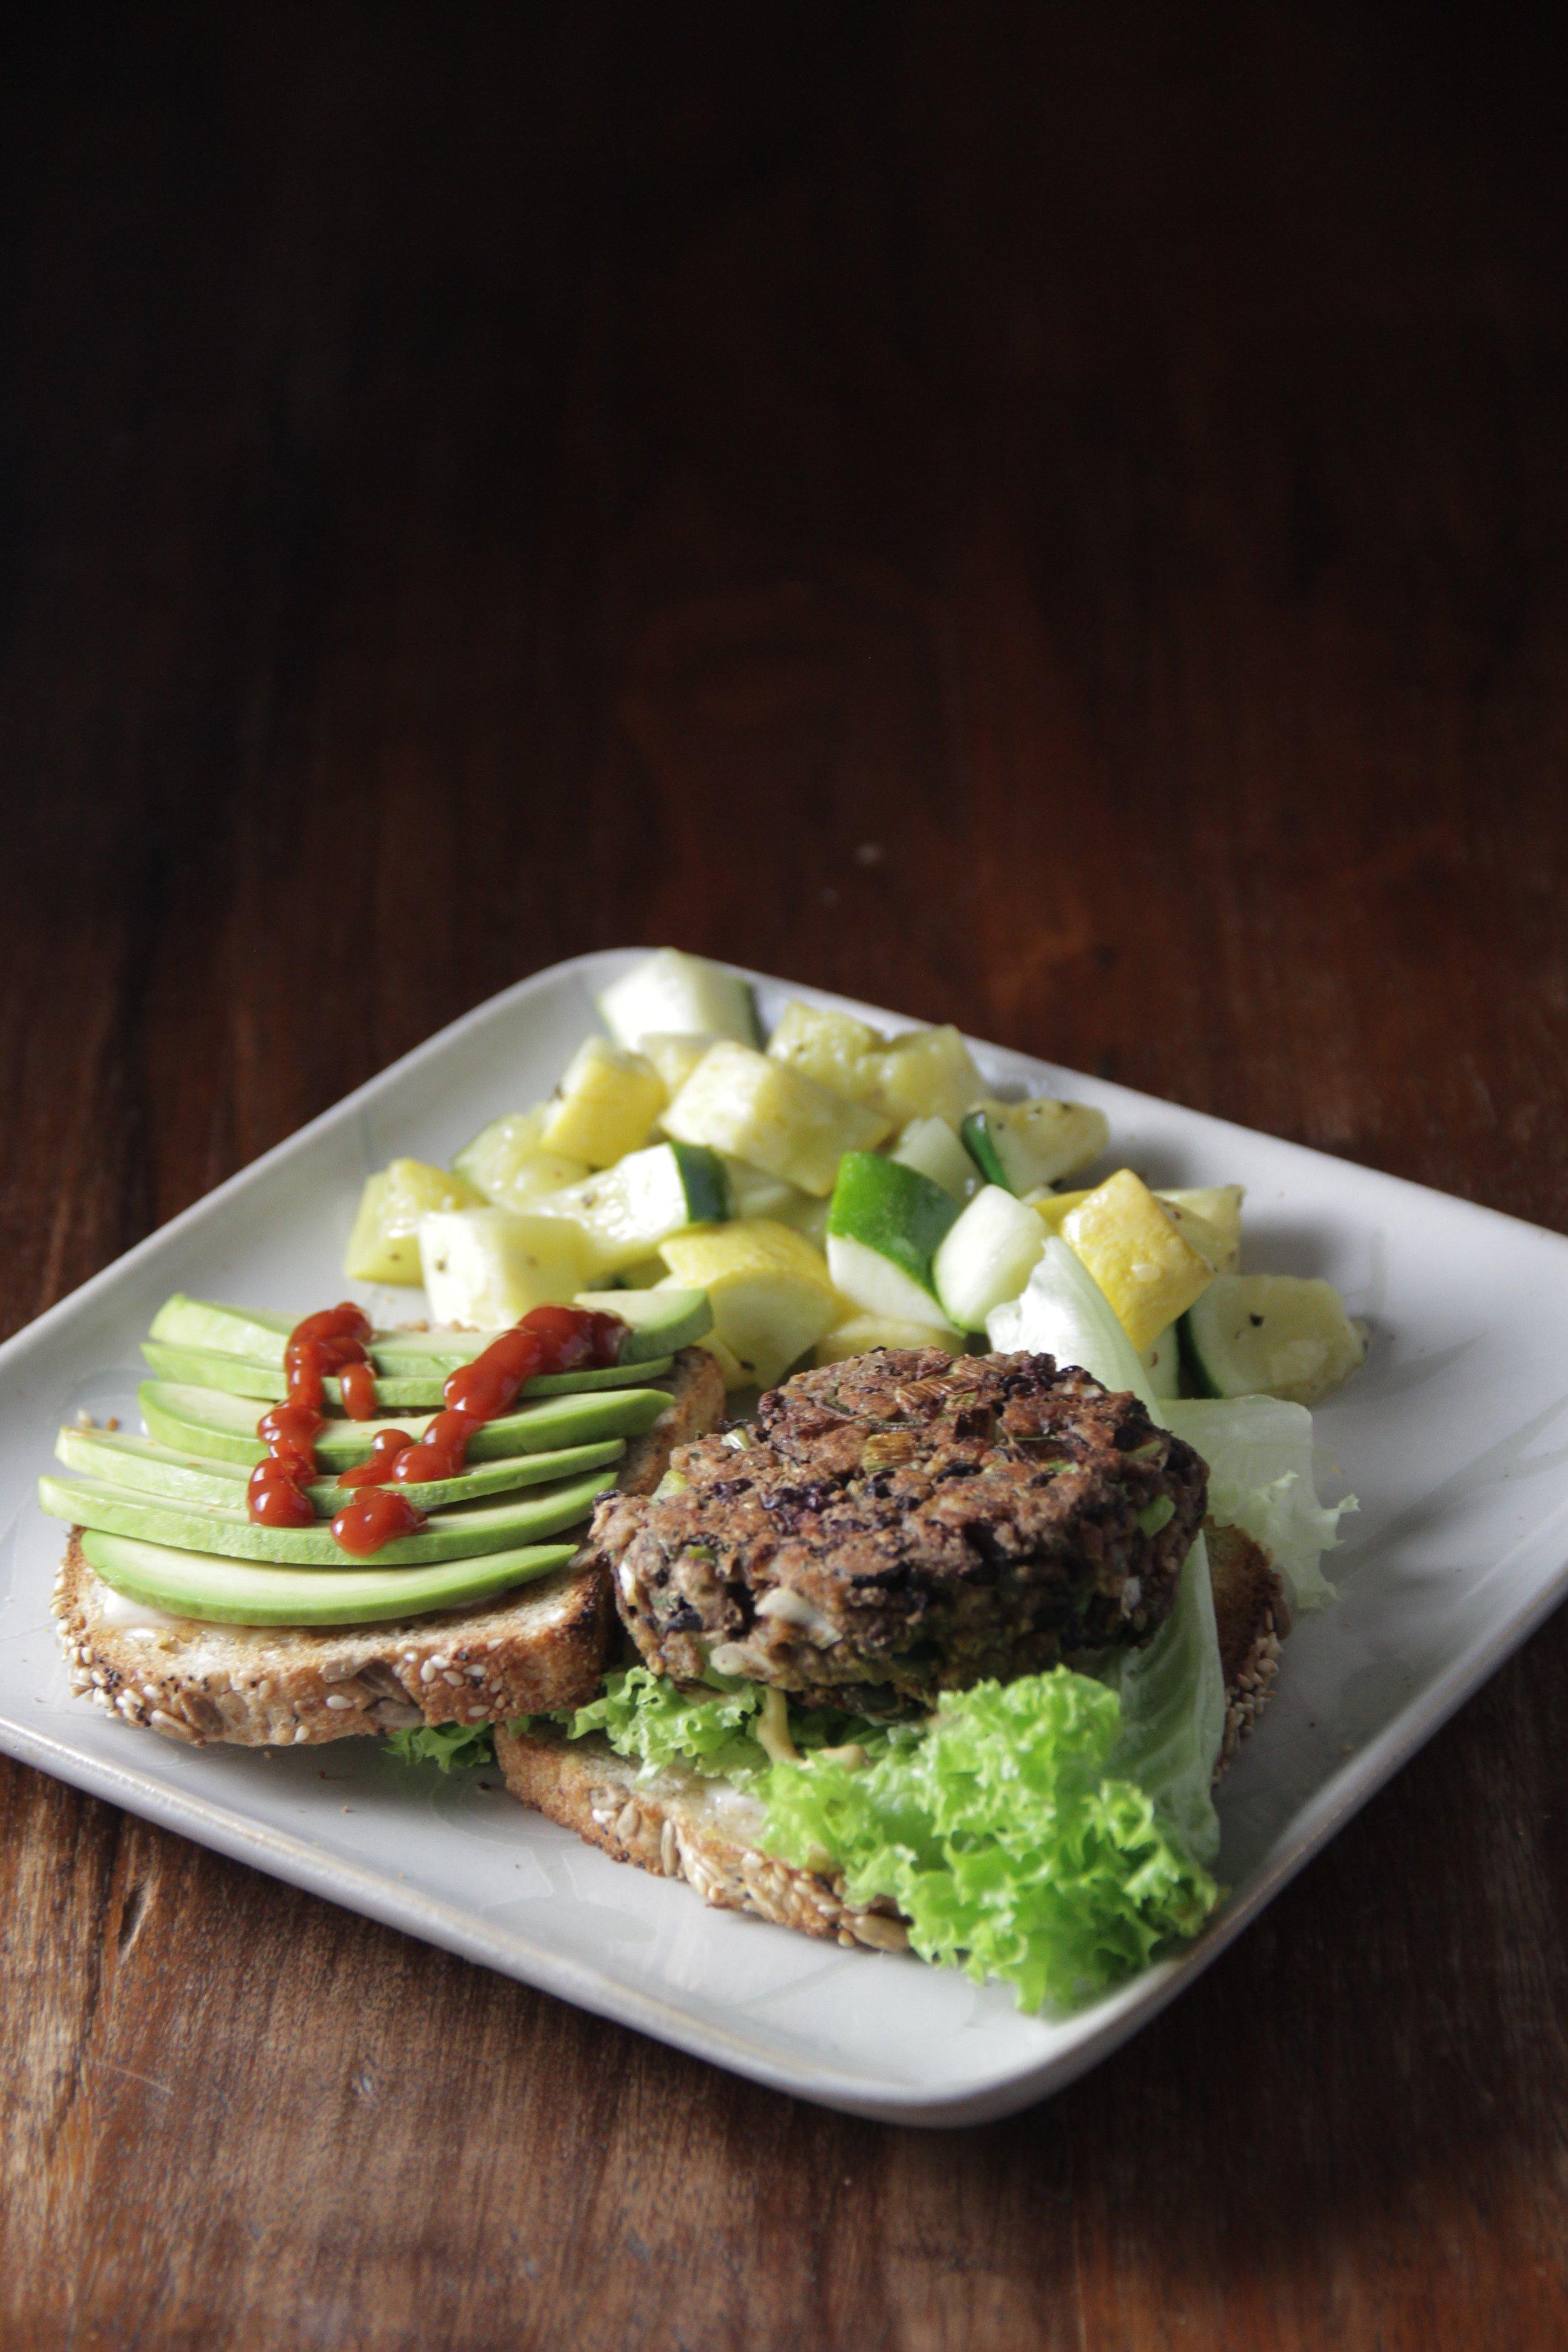 vegetarian back bean burger recipe, gluten free